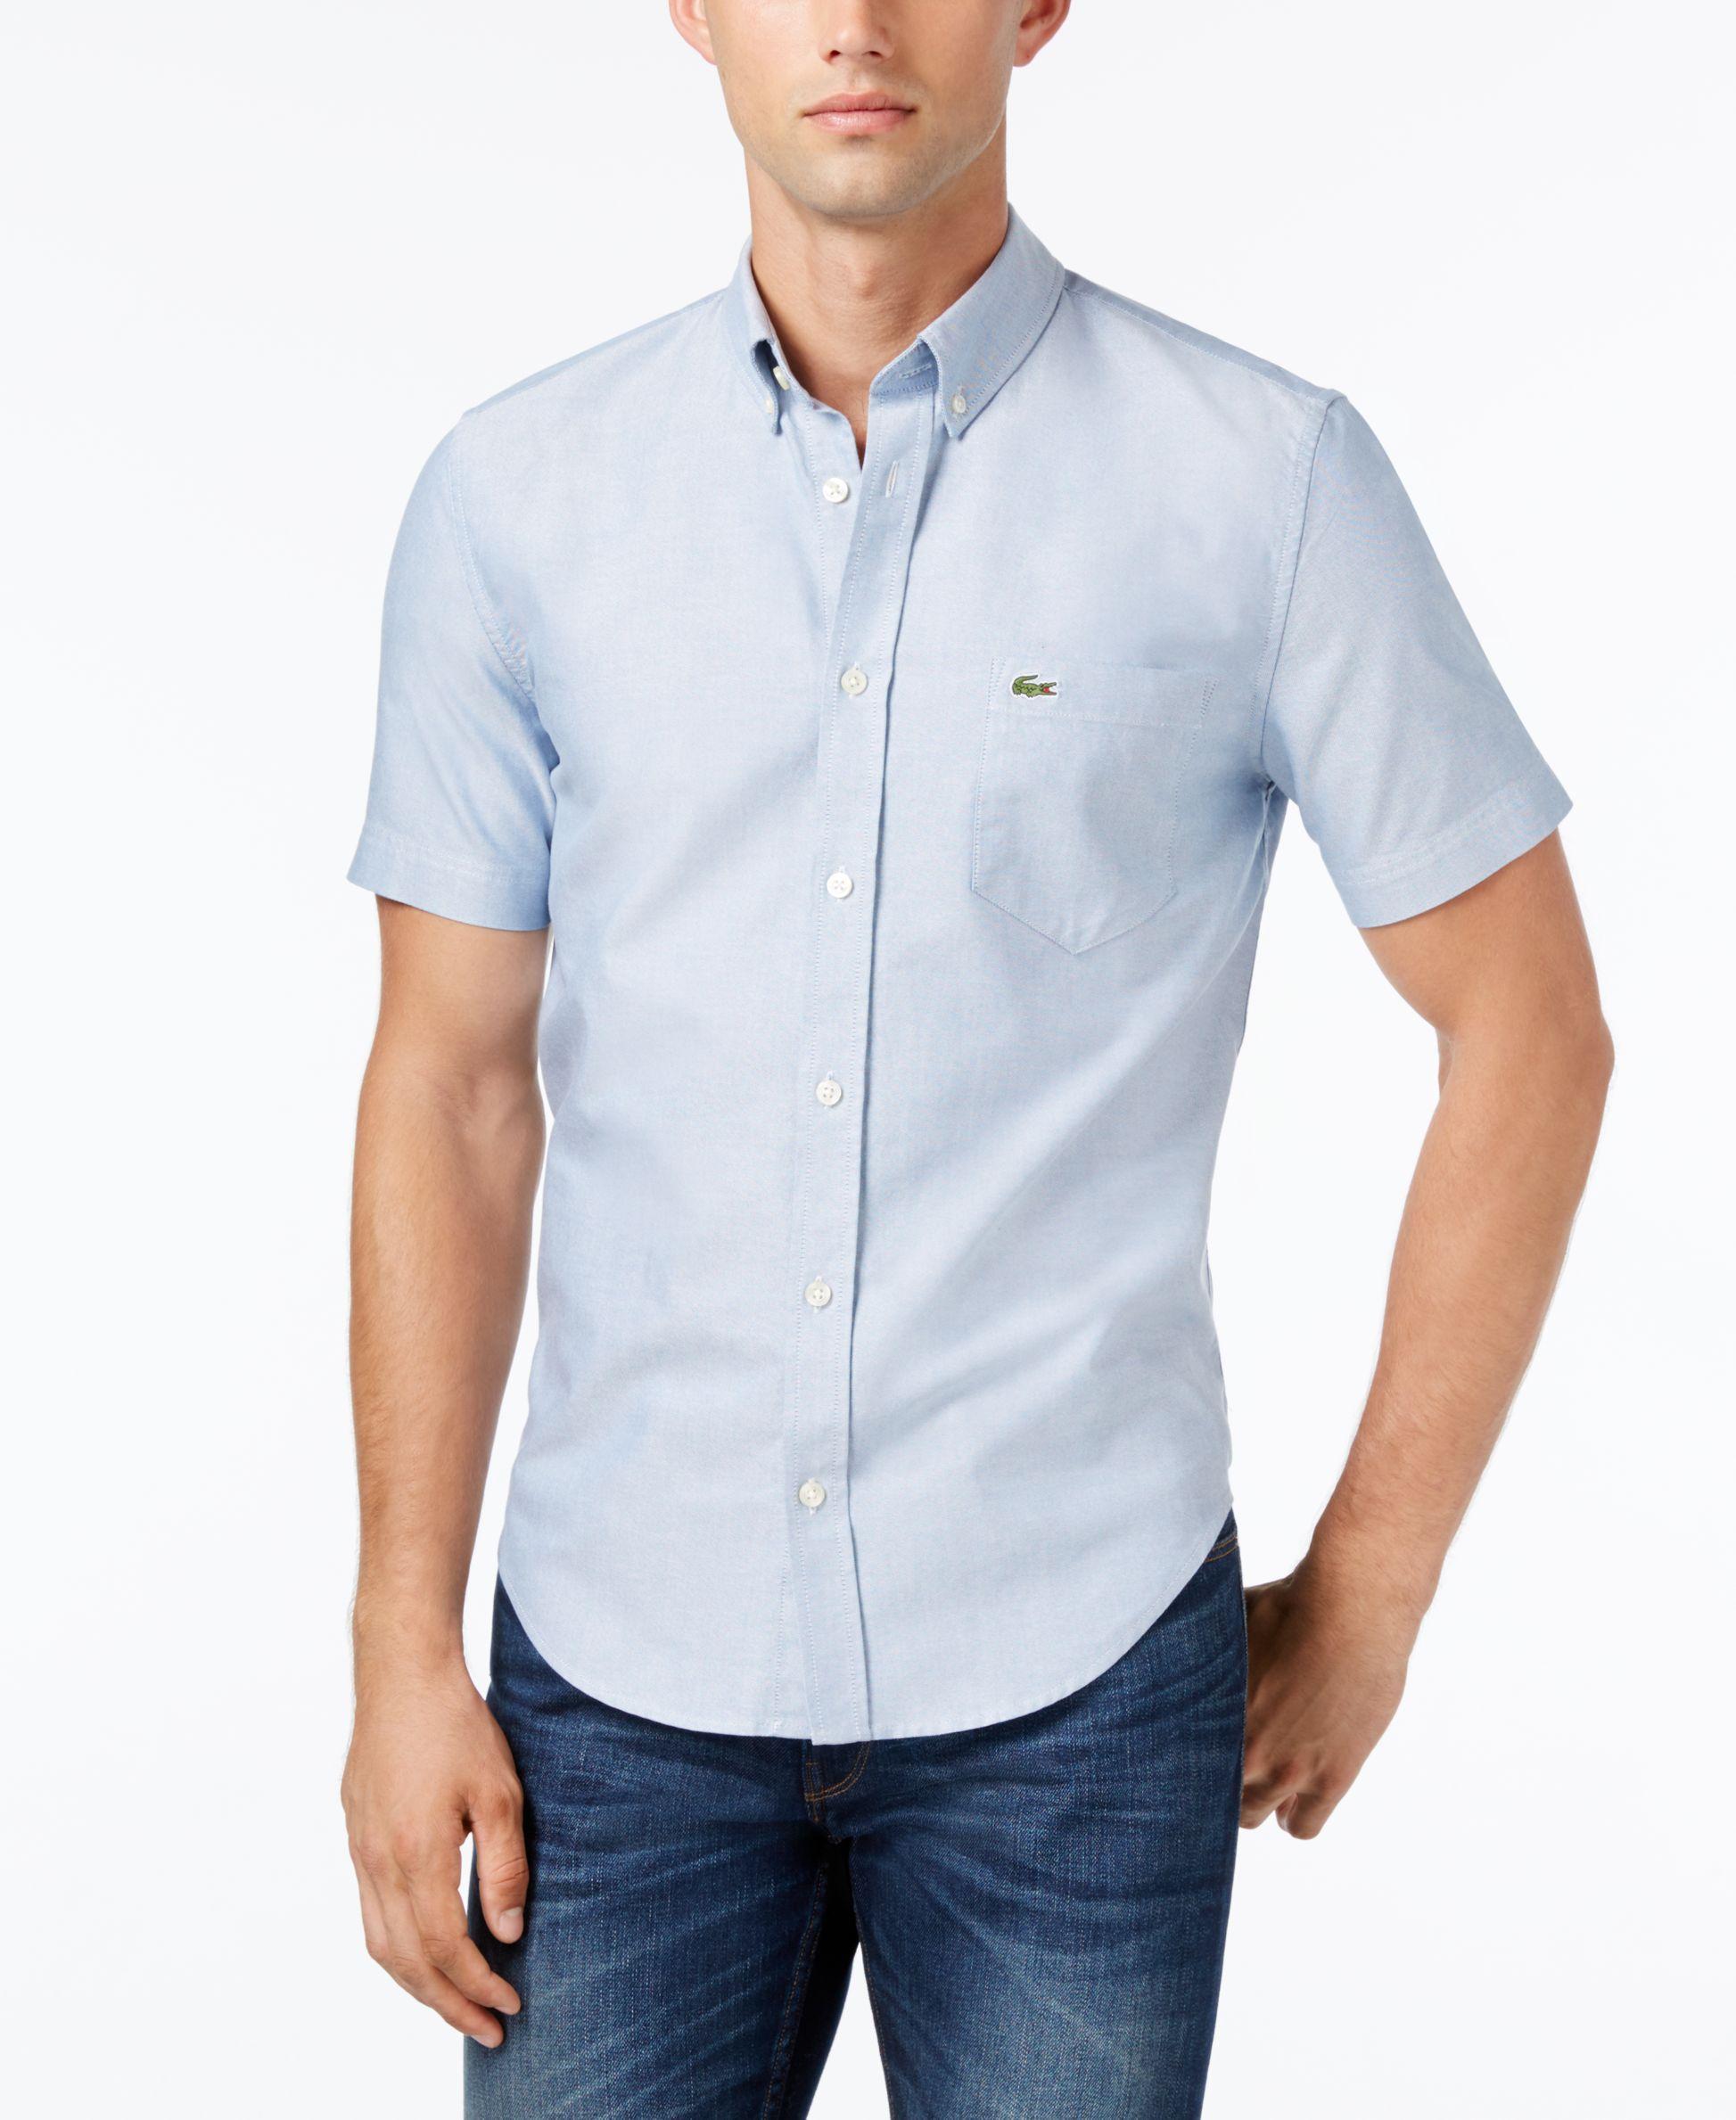 3b963240b Lacoste Men s Woven Short-Sleeve Button-Down Shirt